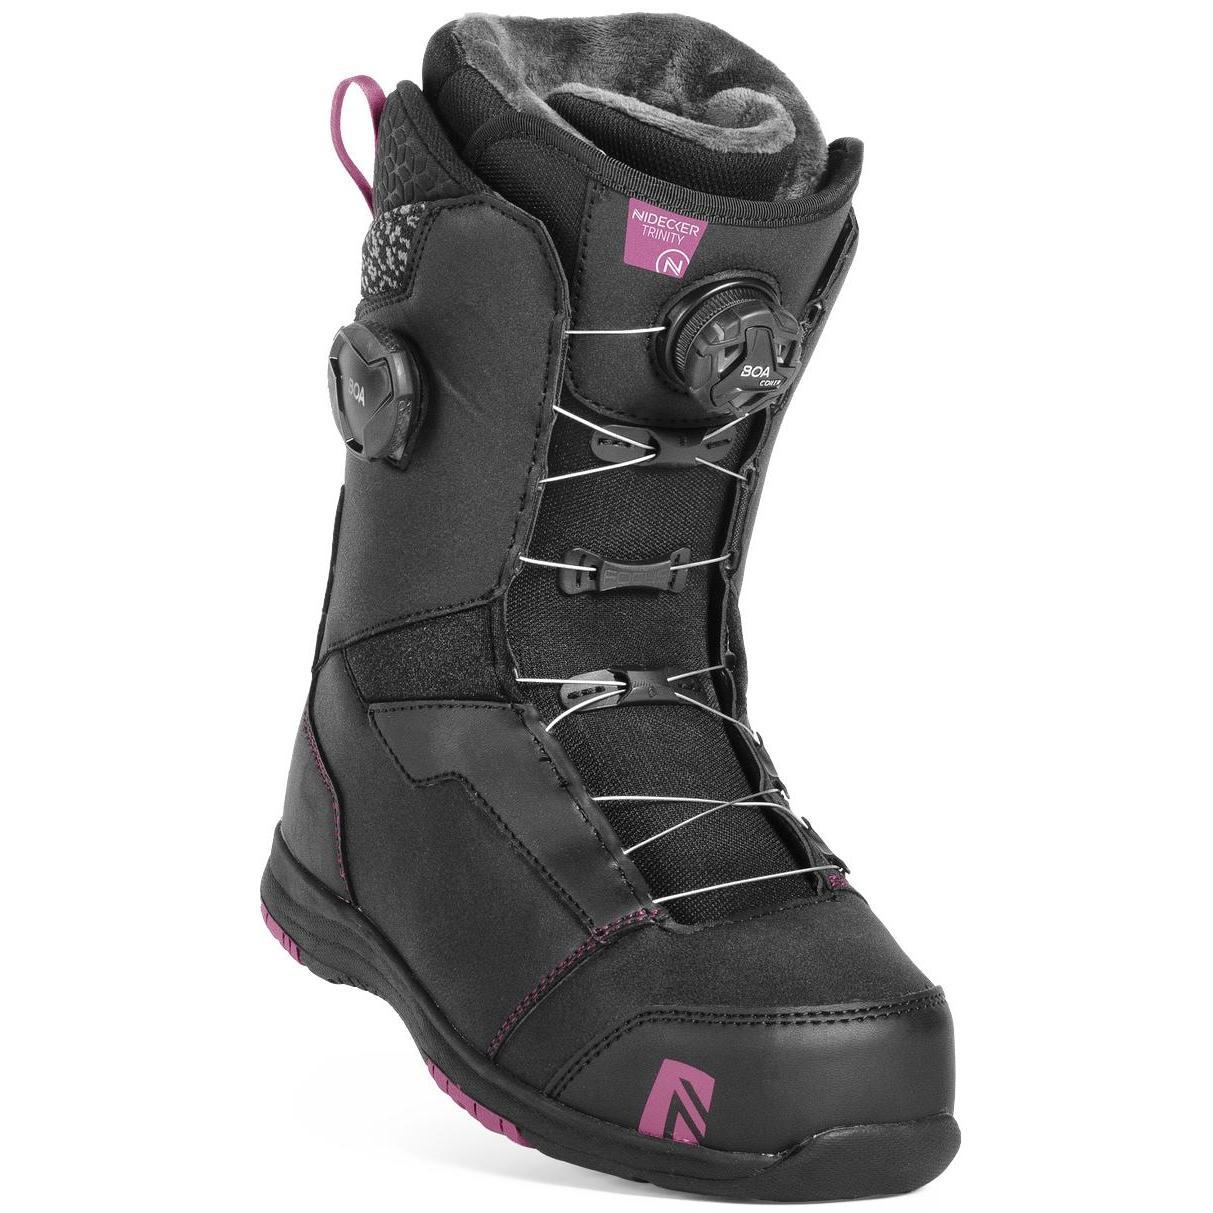 Ботинки для сноуборда NIDECKER 2018-19 Trinity Boa Fcs Black ... 400c3a6be66